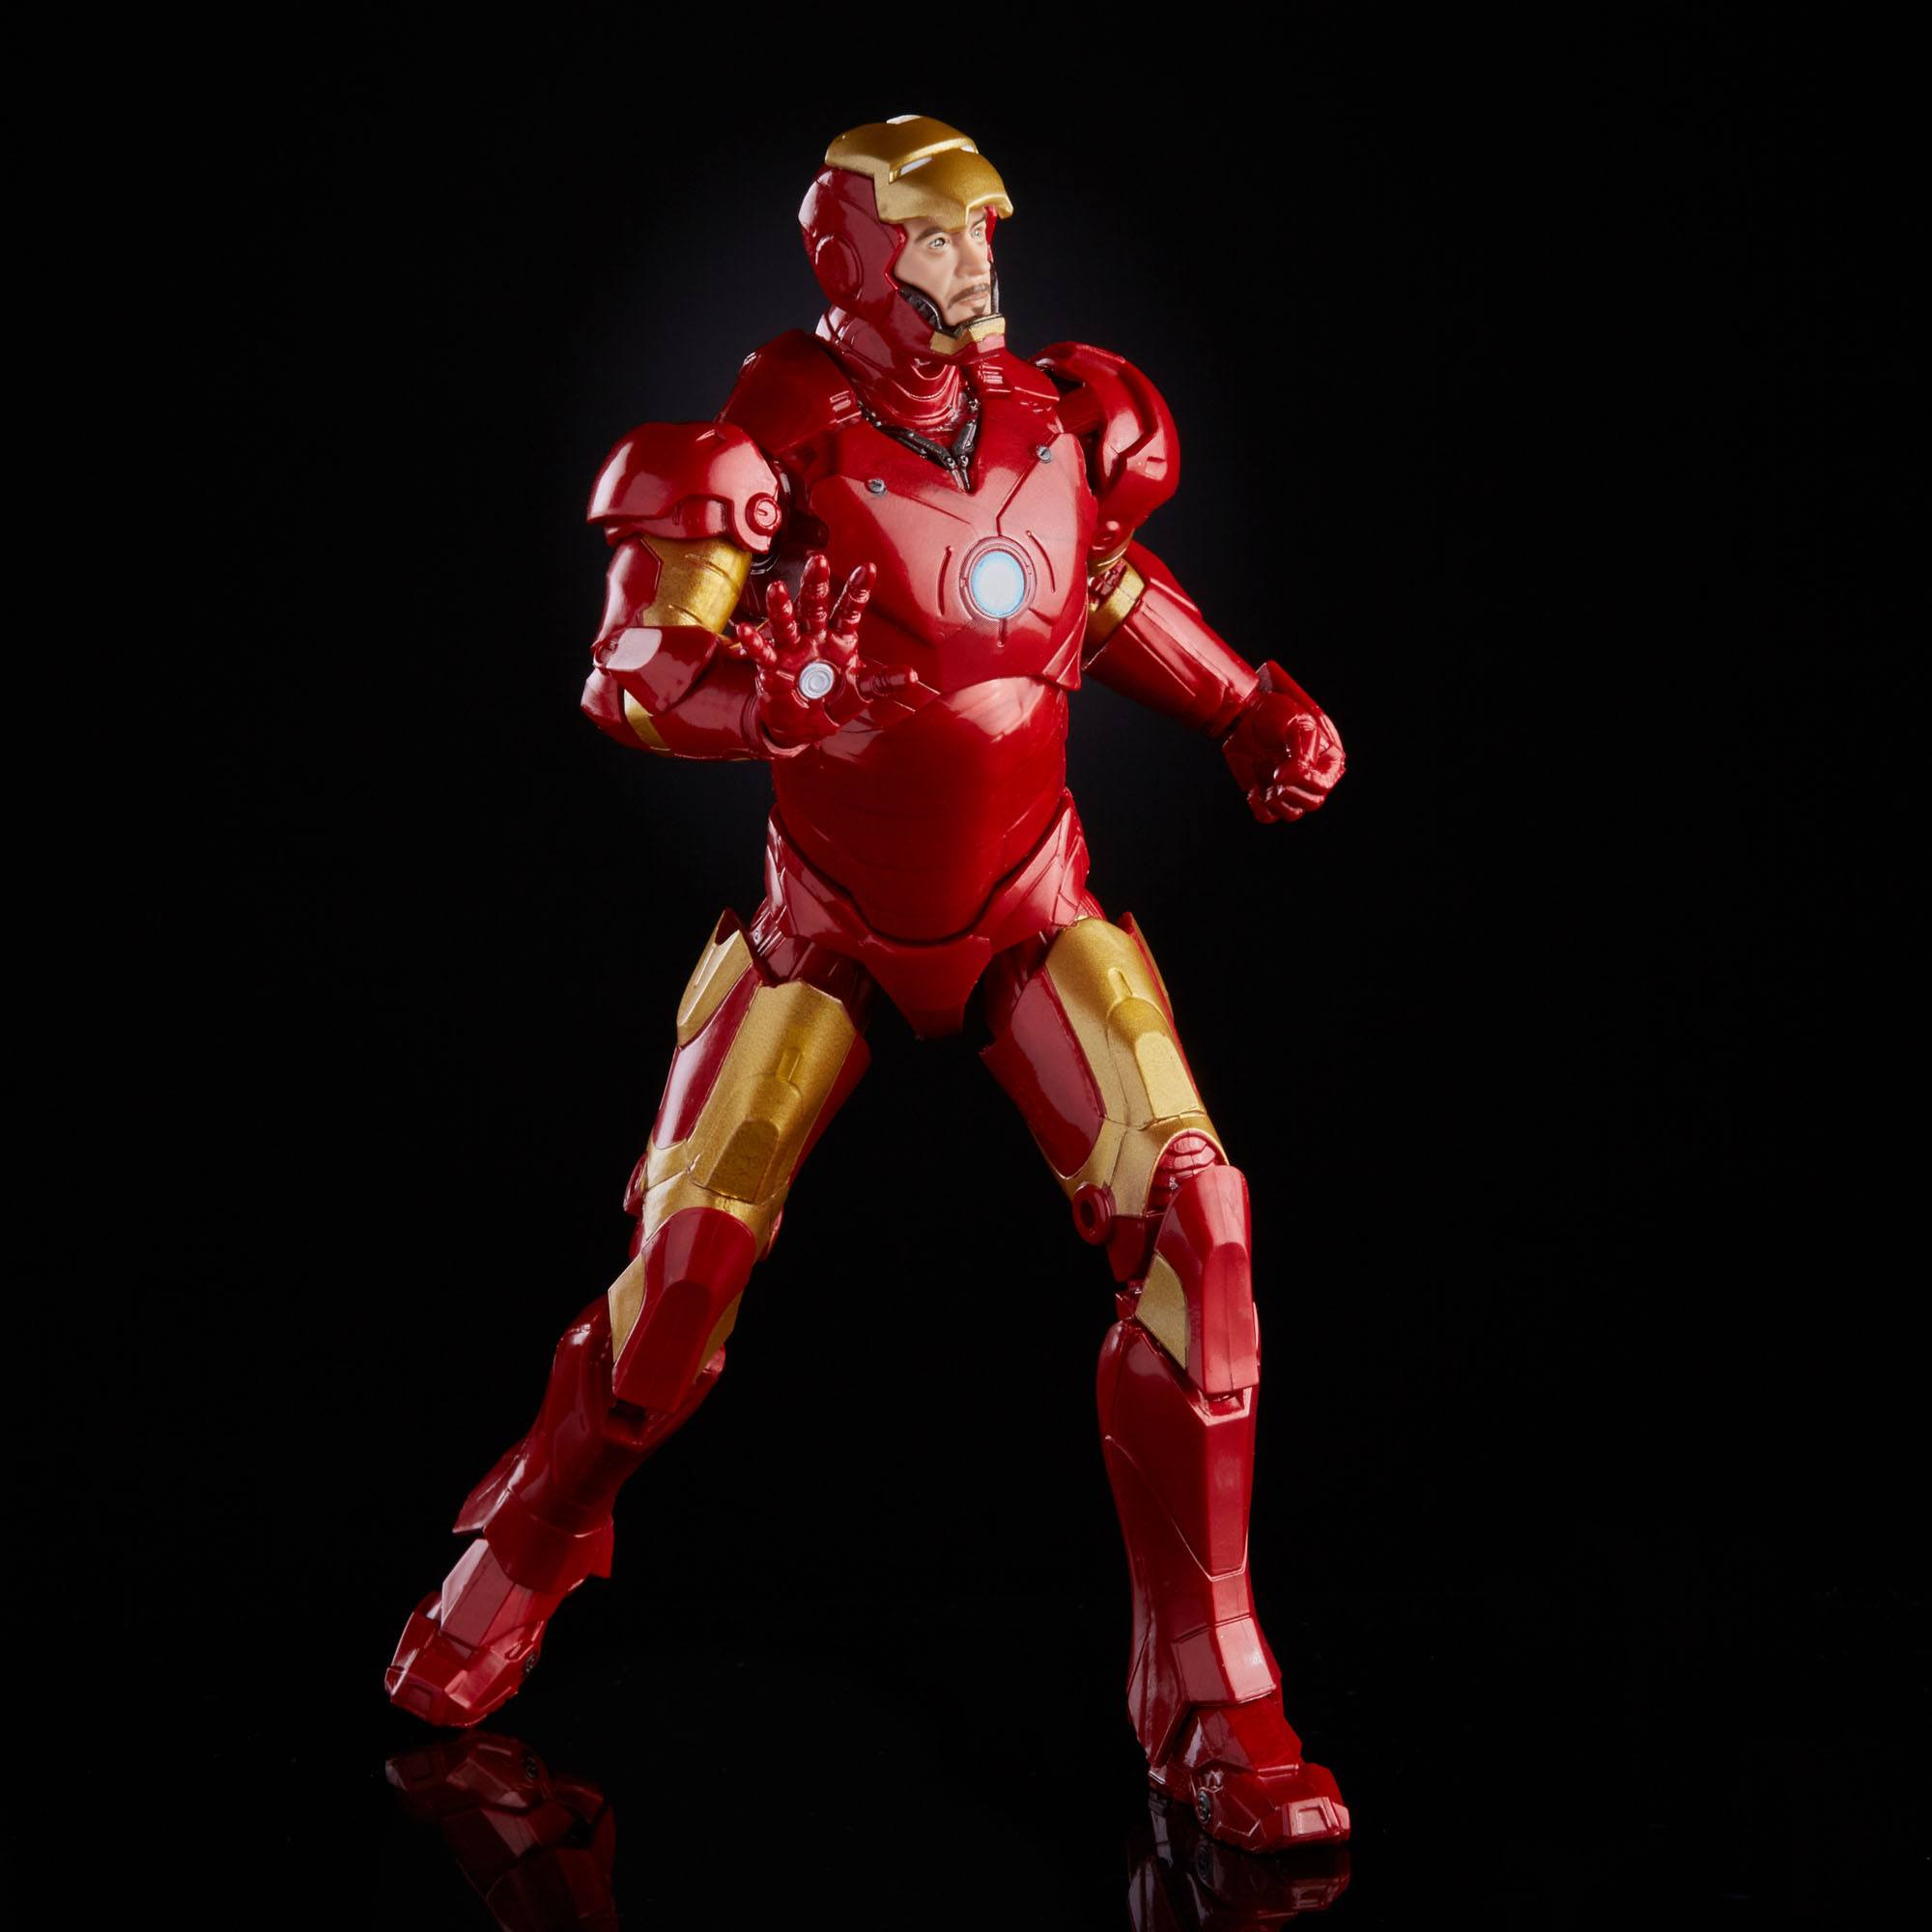 The Infinity Saga Marvel Legends Series Actionfigur 2021 Iron Man Mark III (Iron Man) 15 cm F01845L00 5010993839155